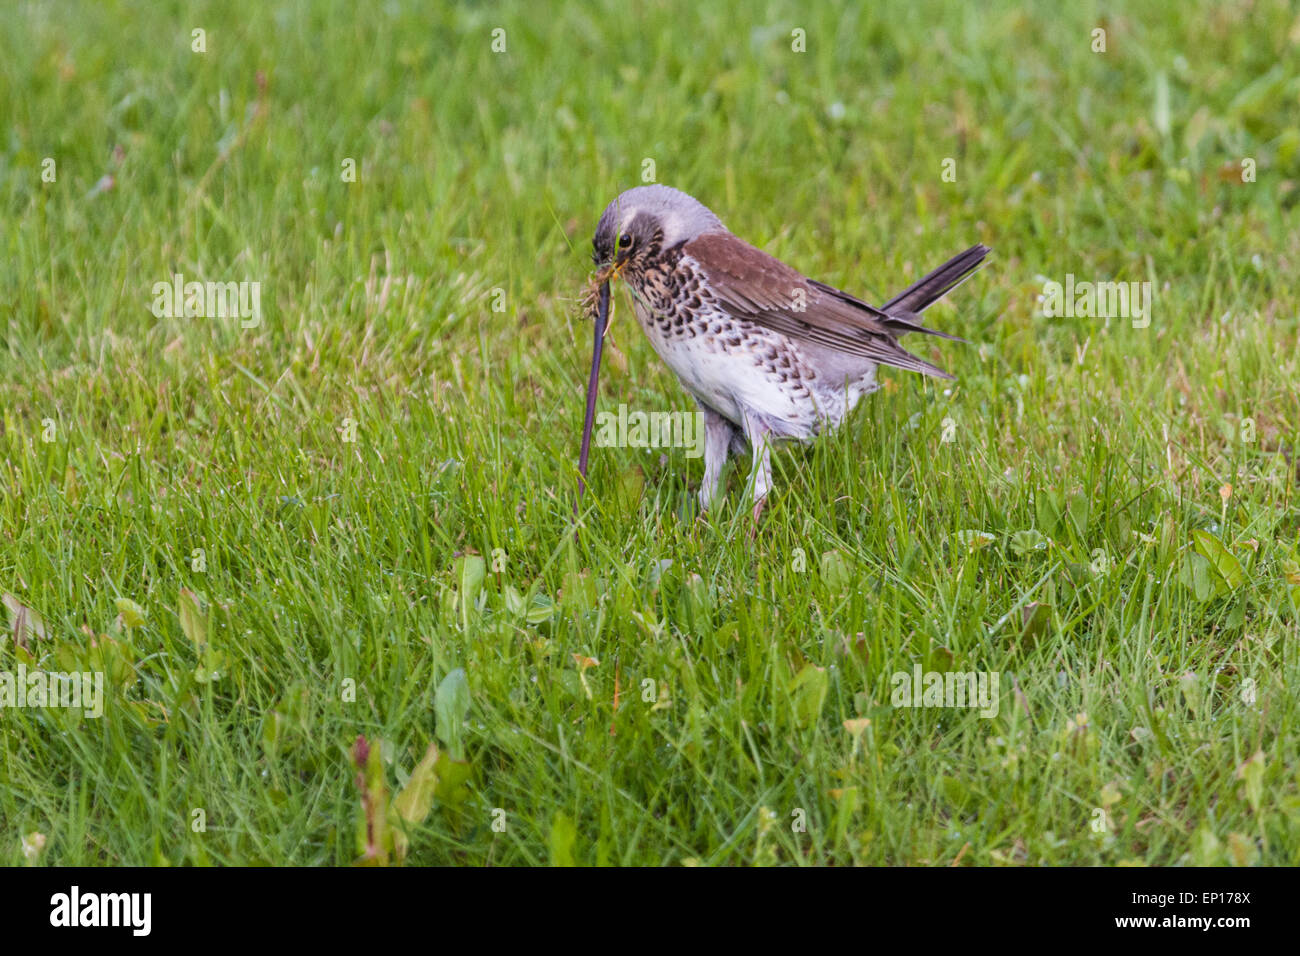 Fieldfare pulling worm from lawn, Gällivare, Sweden - Stock Image